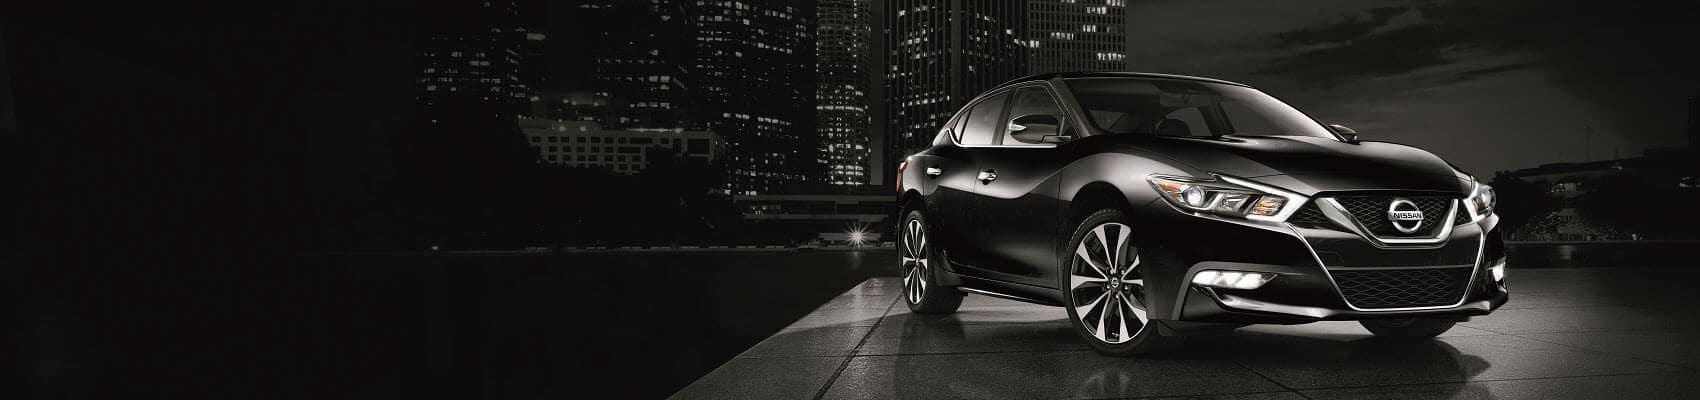 Nissan Maxima Black